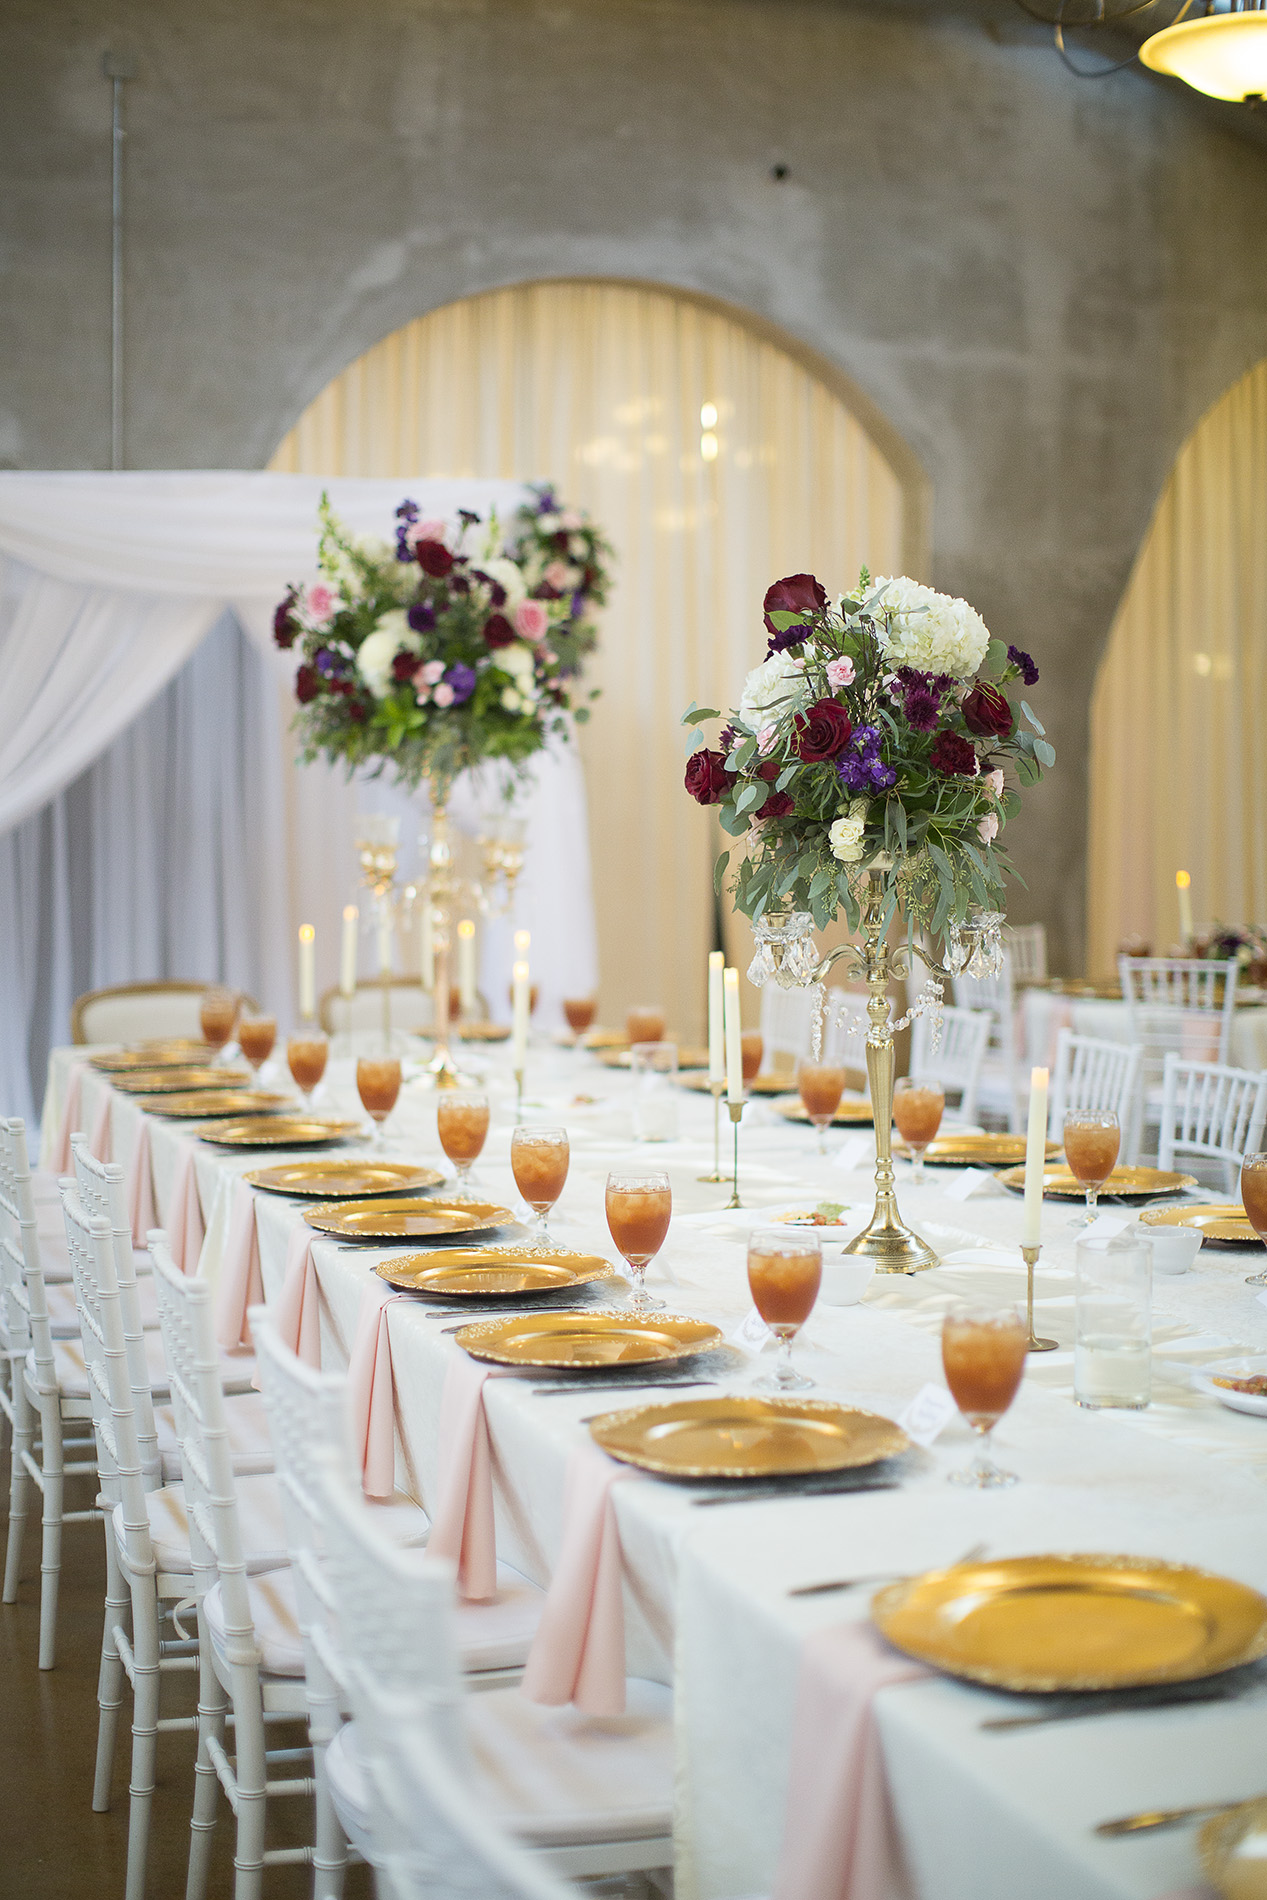 Houston-venue-Olde-Dobbin-Station-Romantic-Classic-Wedding-Photographer-080.jpg